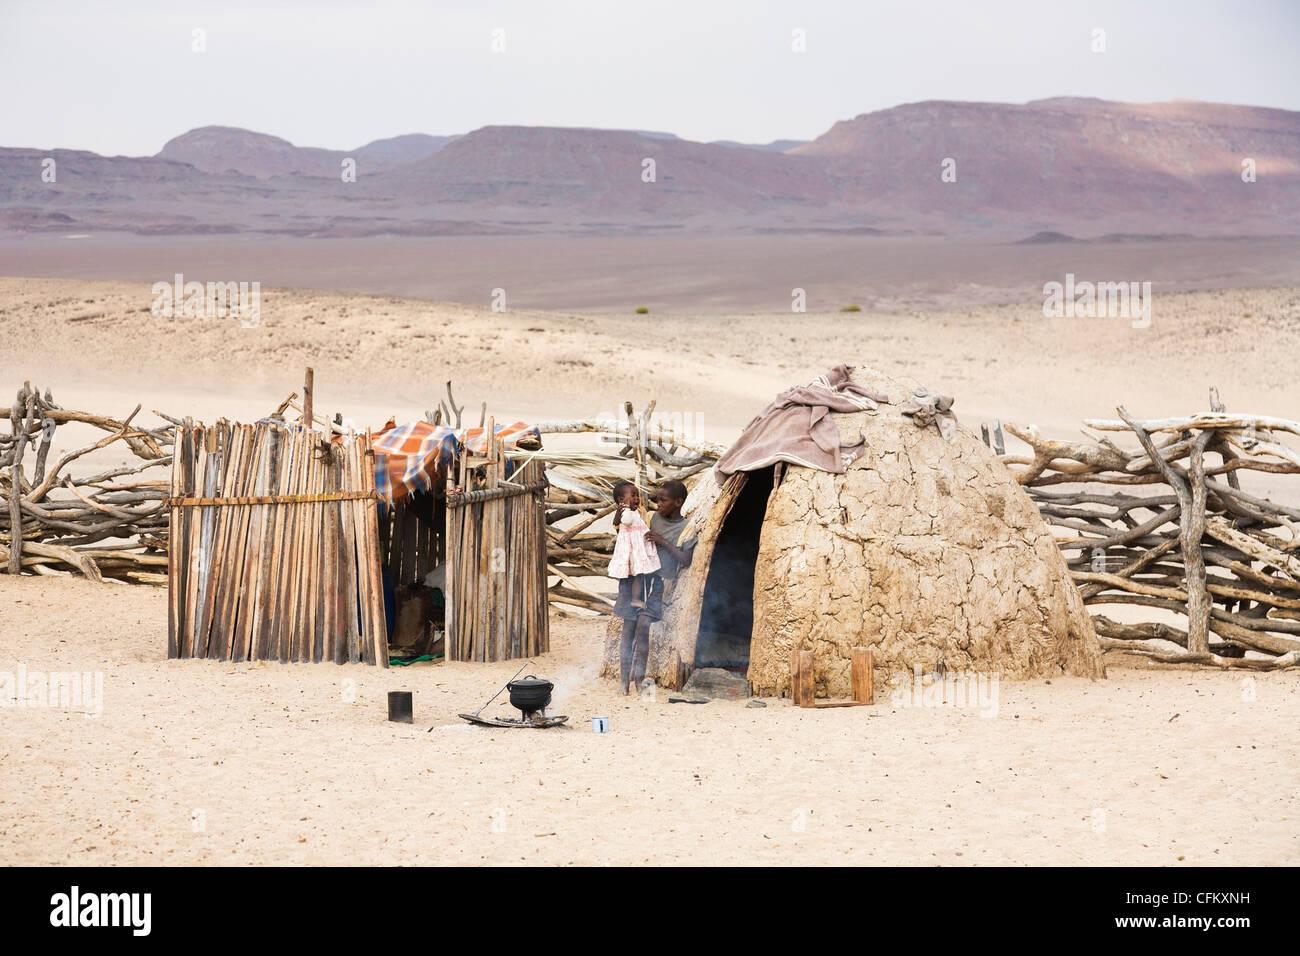 Boy holding baby girl in Himba village, Skeleton Coast, Namibia, west Africa outside mud hut within village cattle - Stock Image